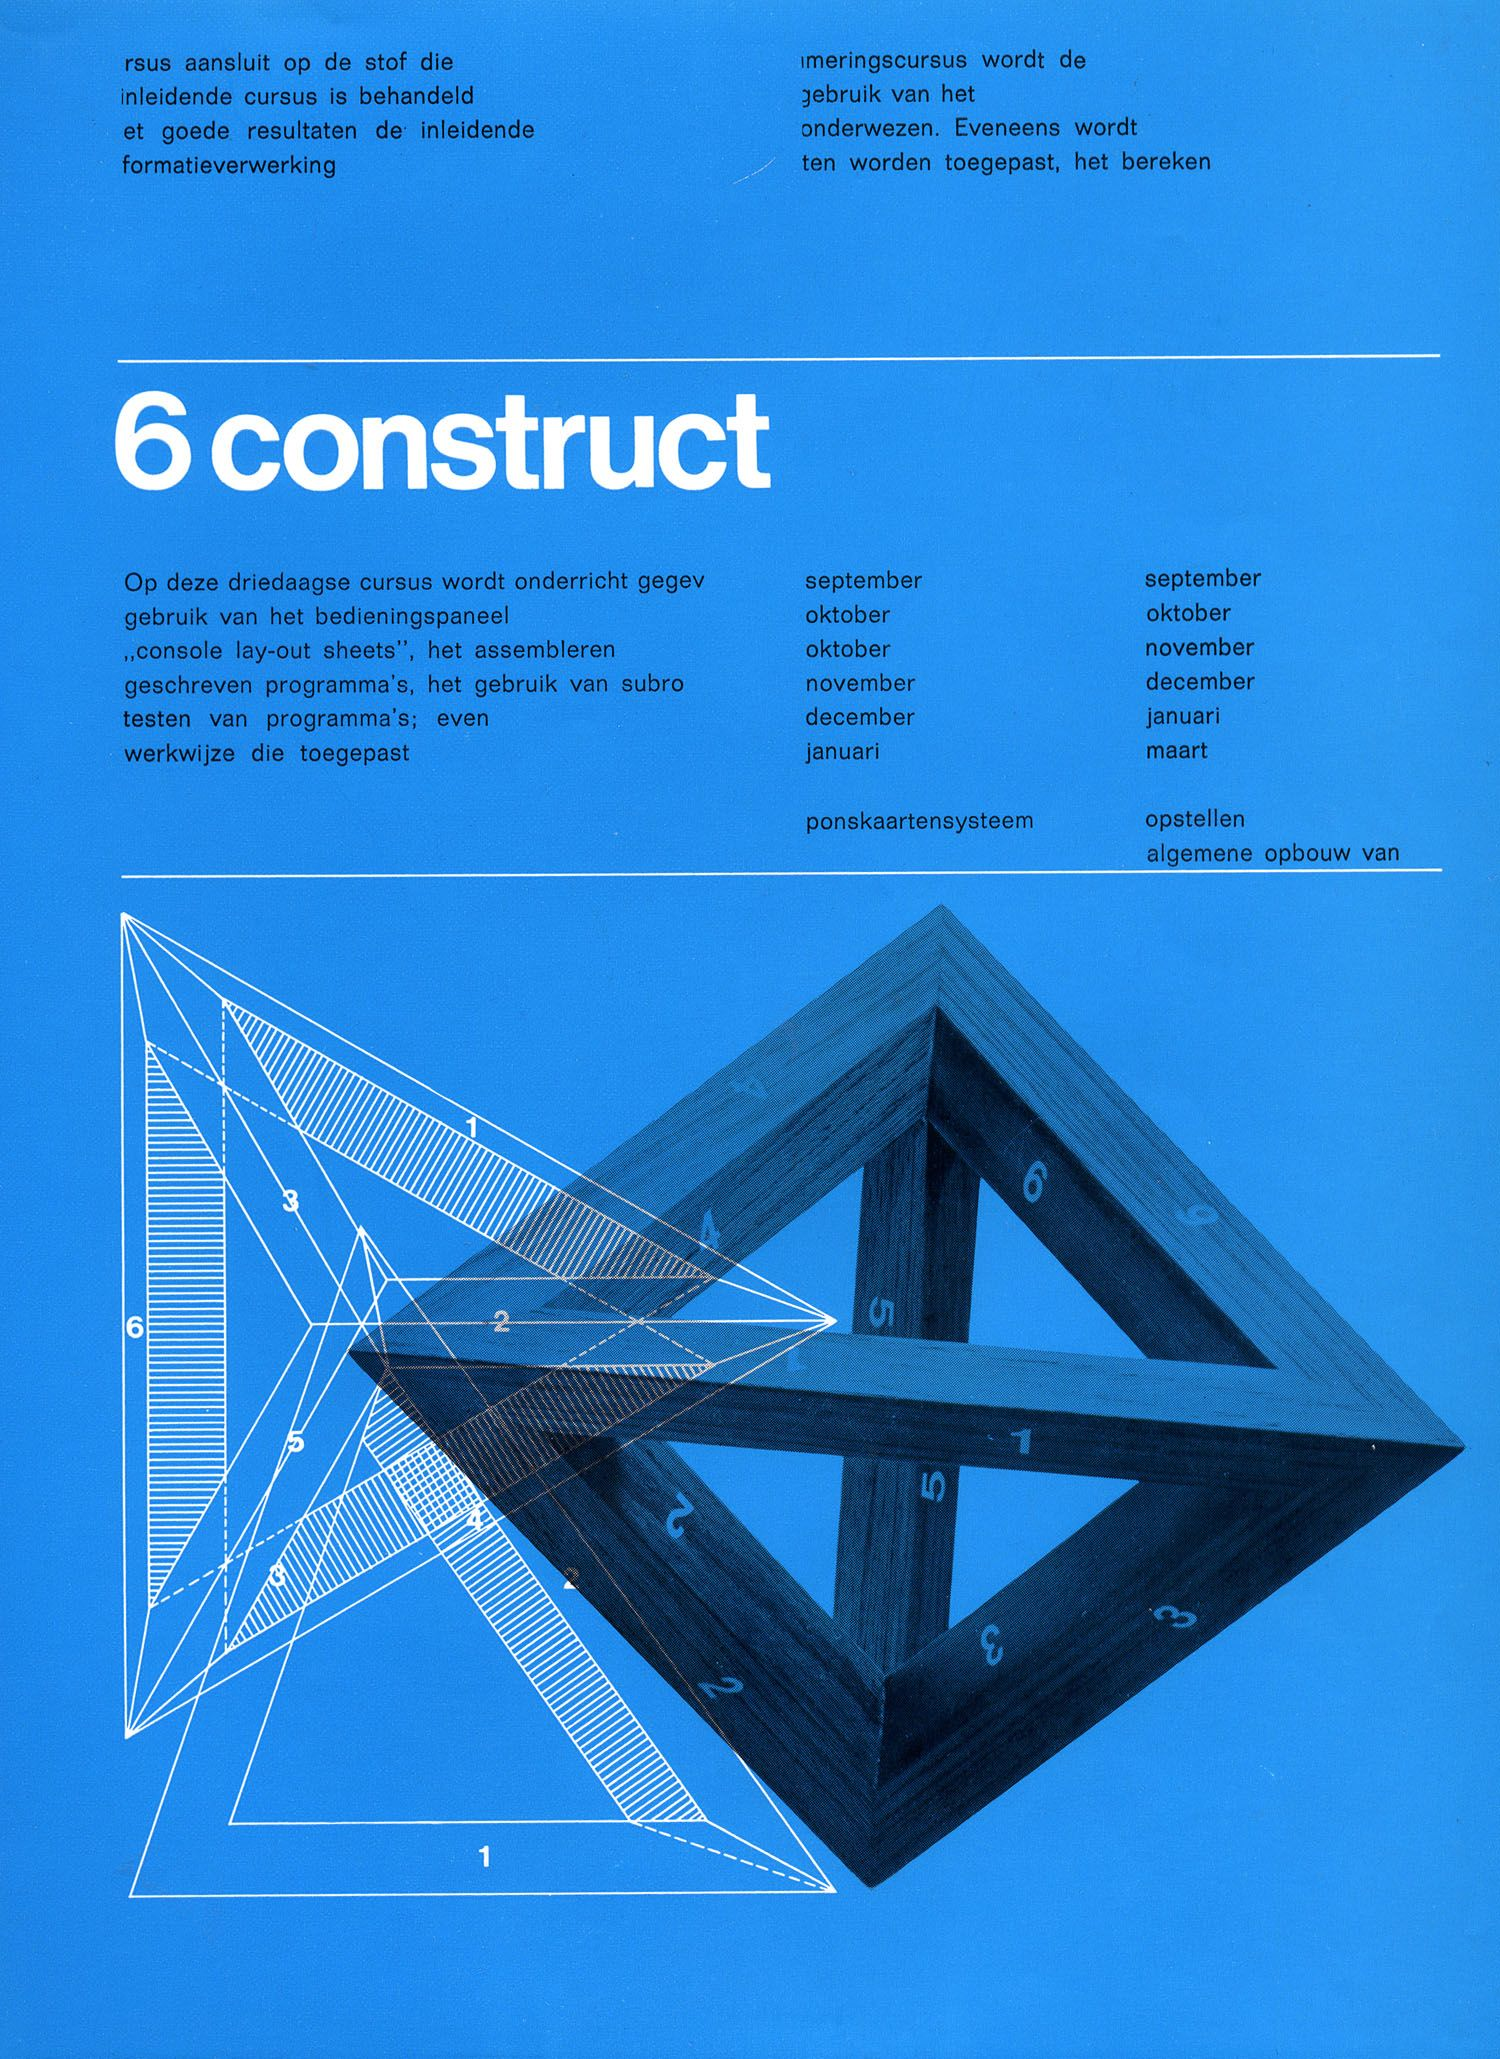 6 construct cursus [ontwerp], Benno Wissing